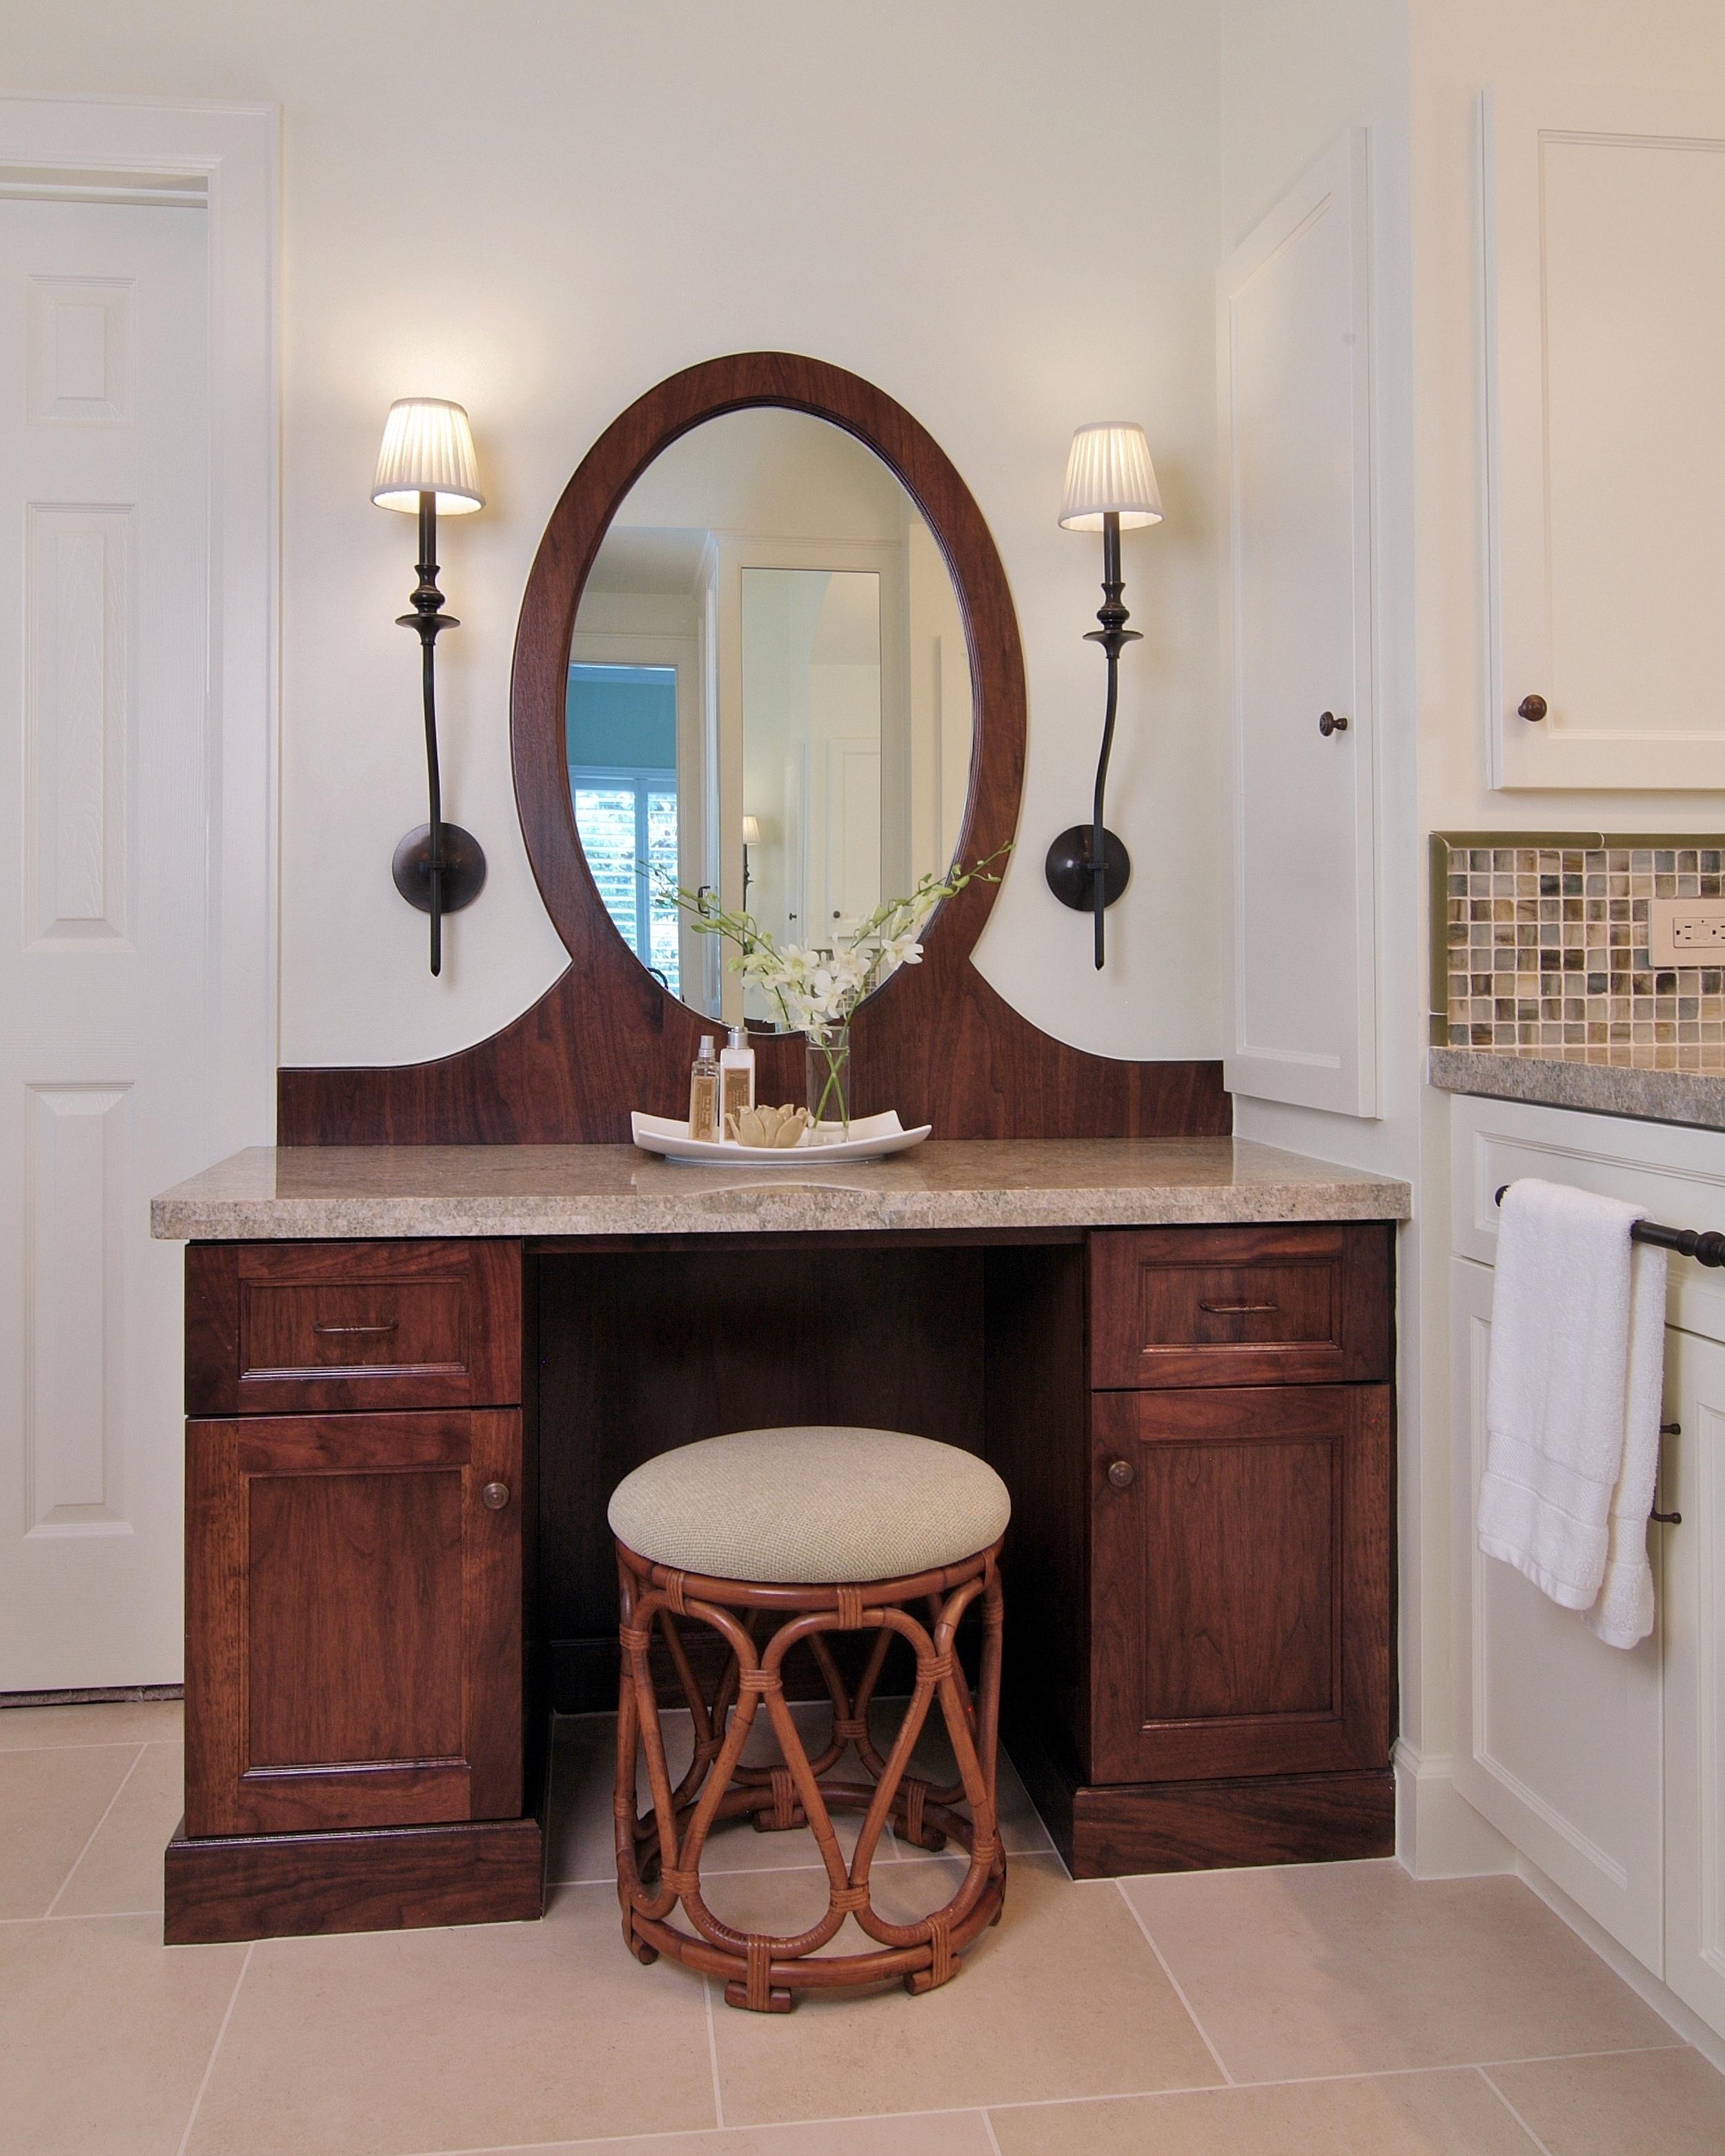 Bathroom remodel with vanity, Designer: Carla Aston